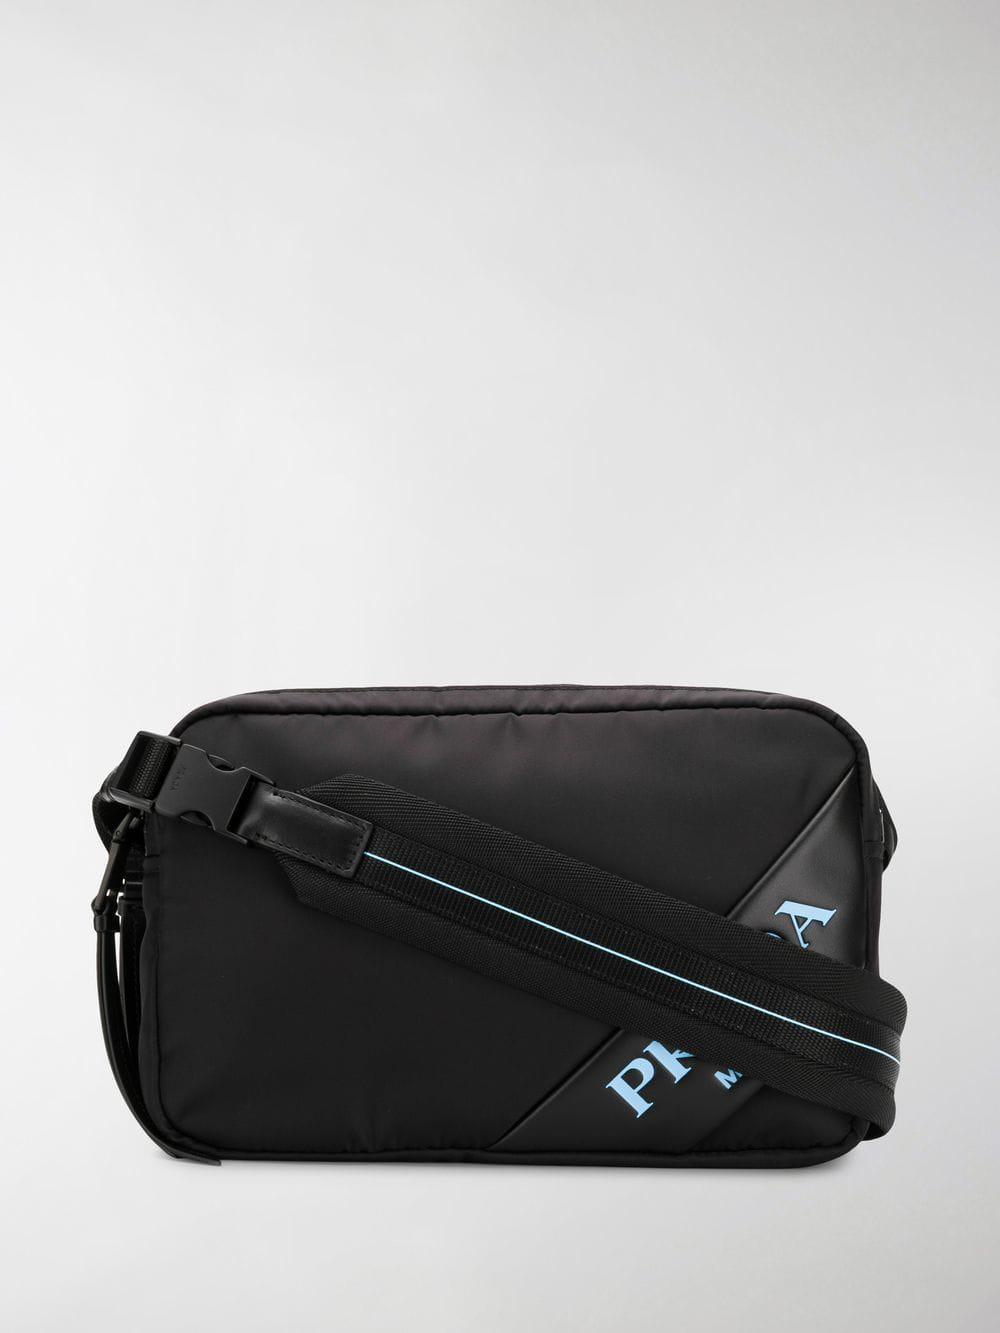 75e1f9c17d Lyst - Prada Logo Crossbody Bag in Black